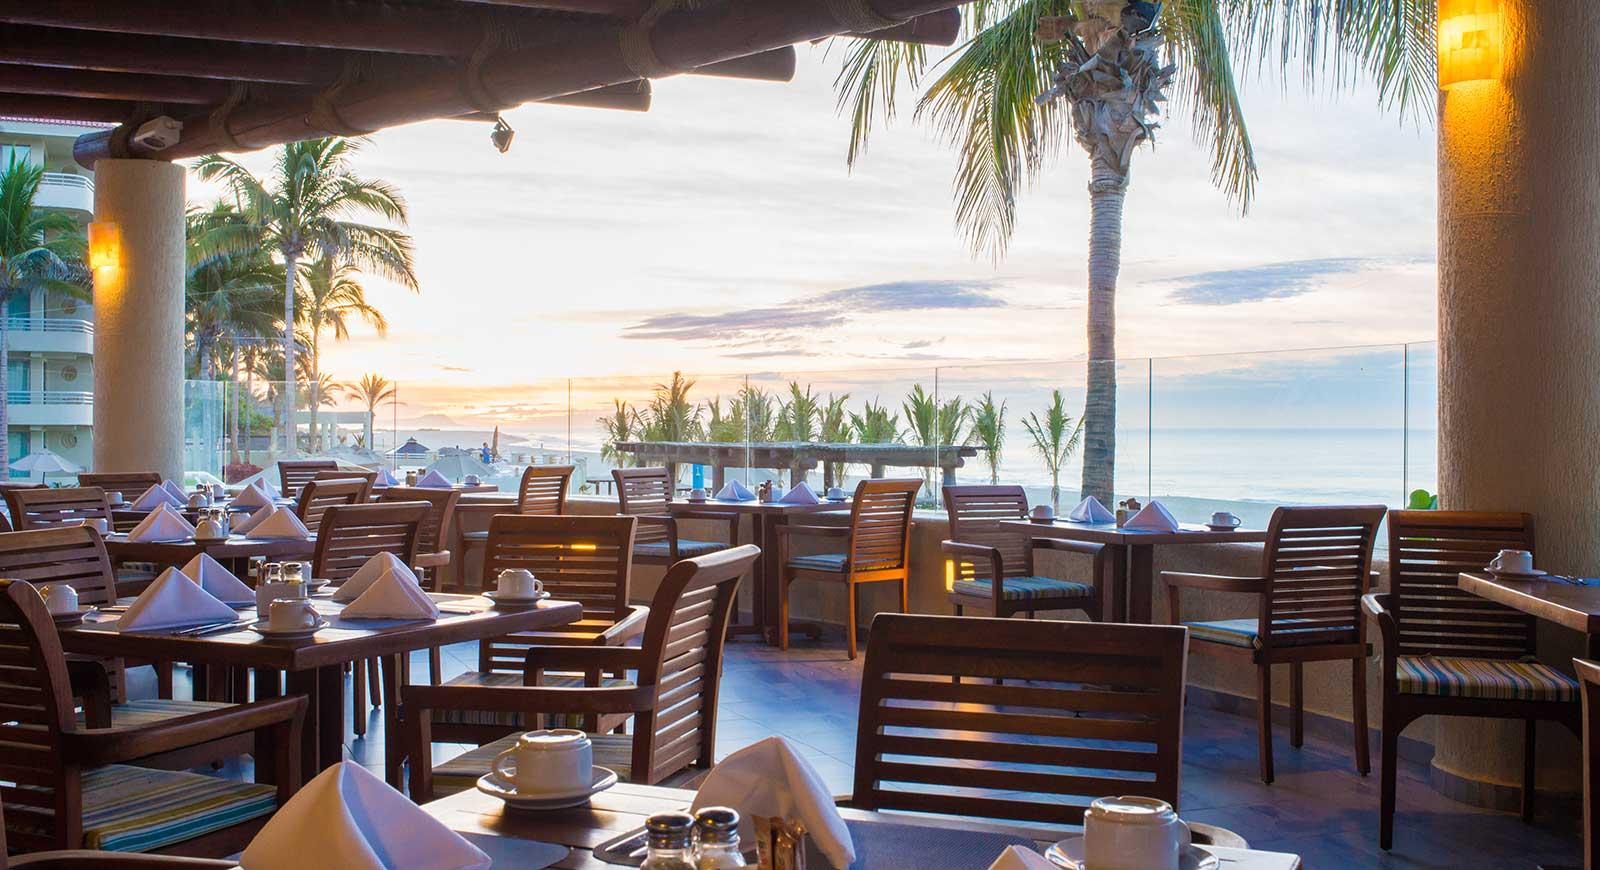 363-restaurant-16-hotel-barcelo-grand-fa